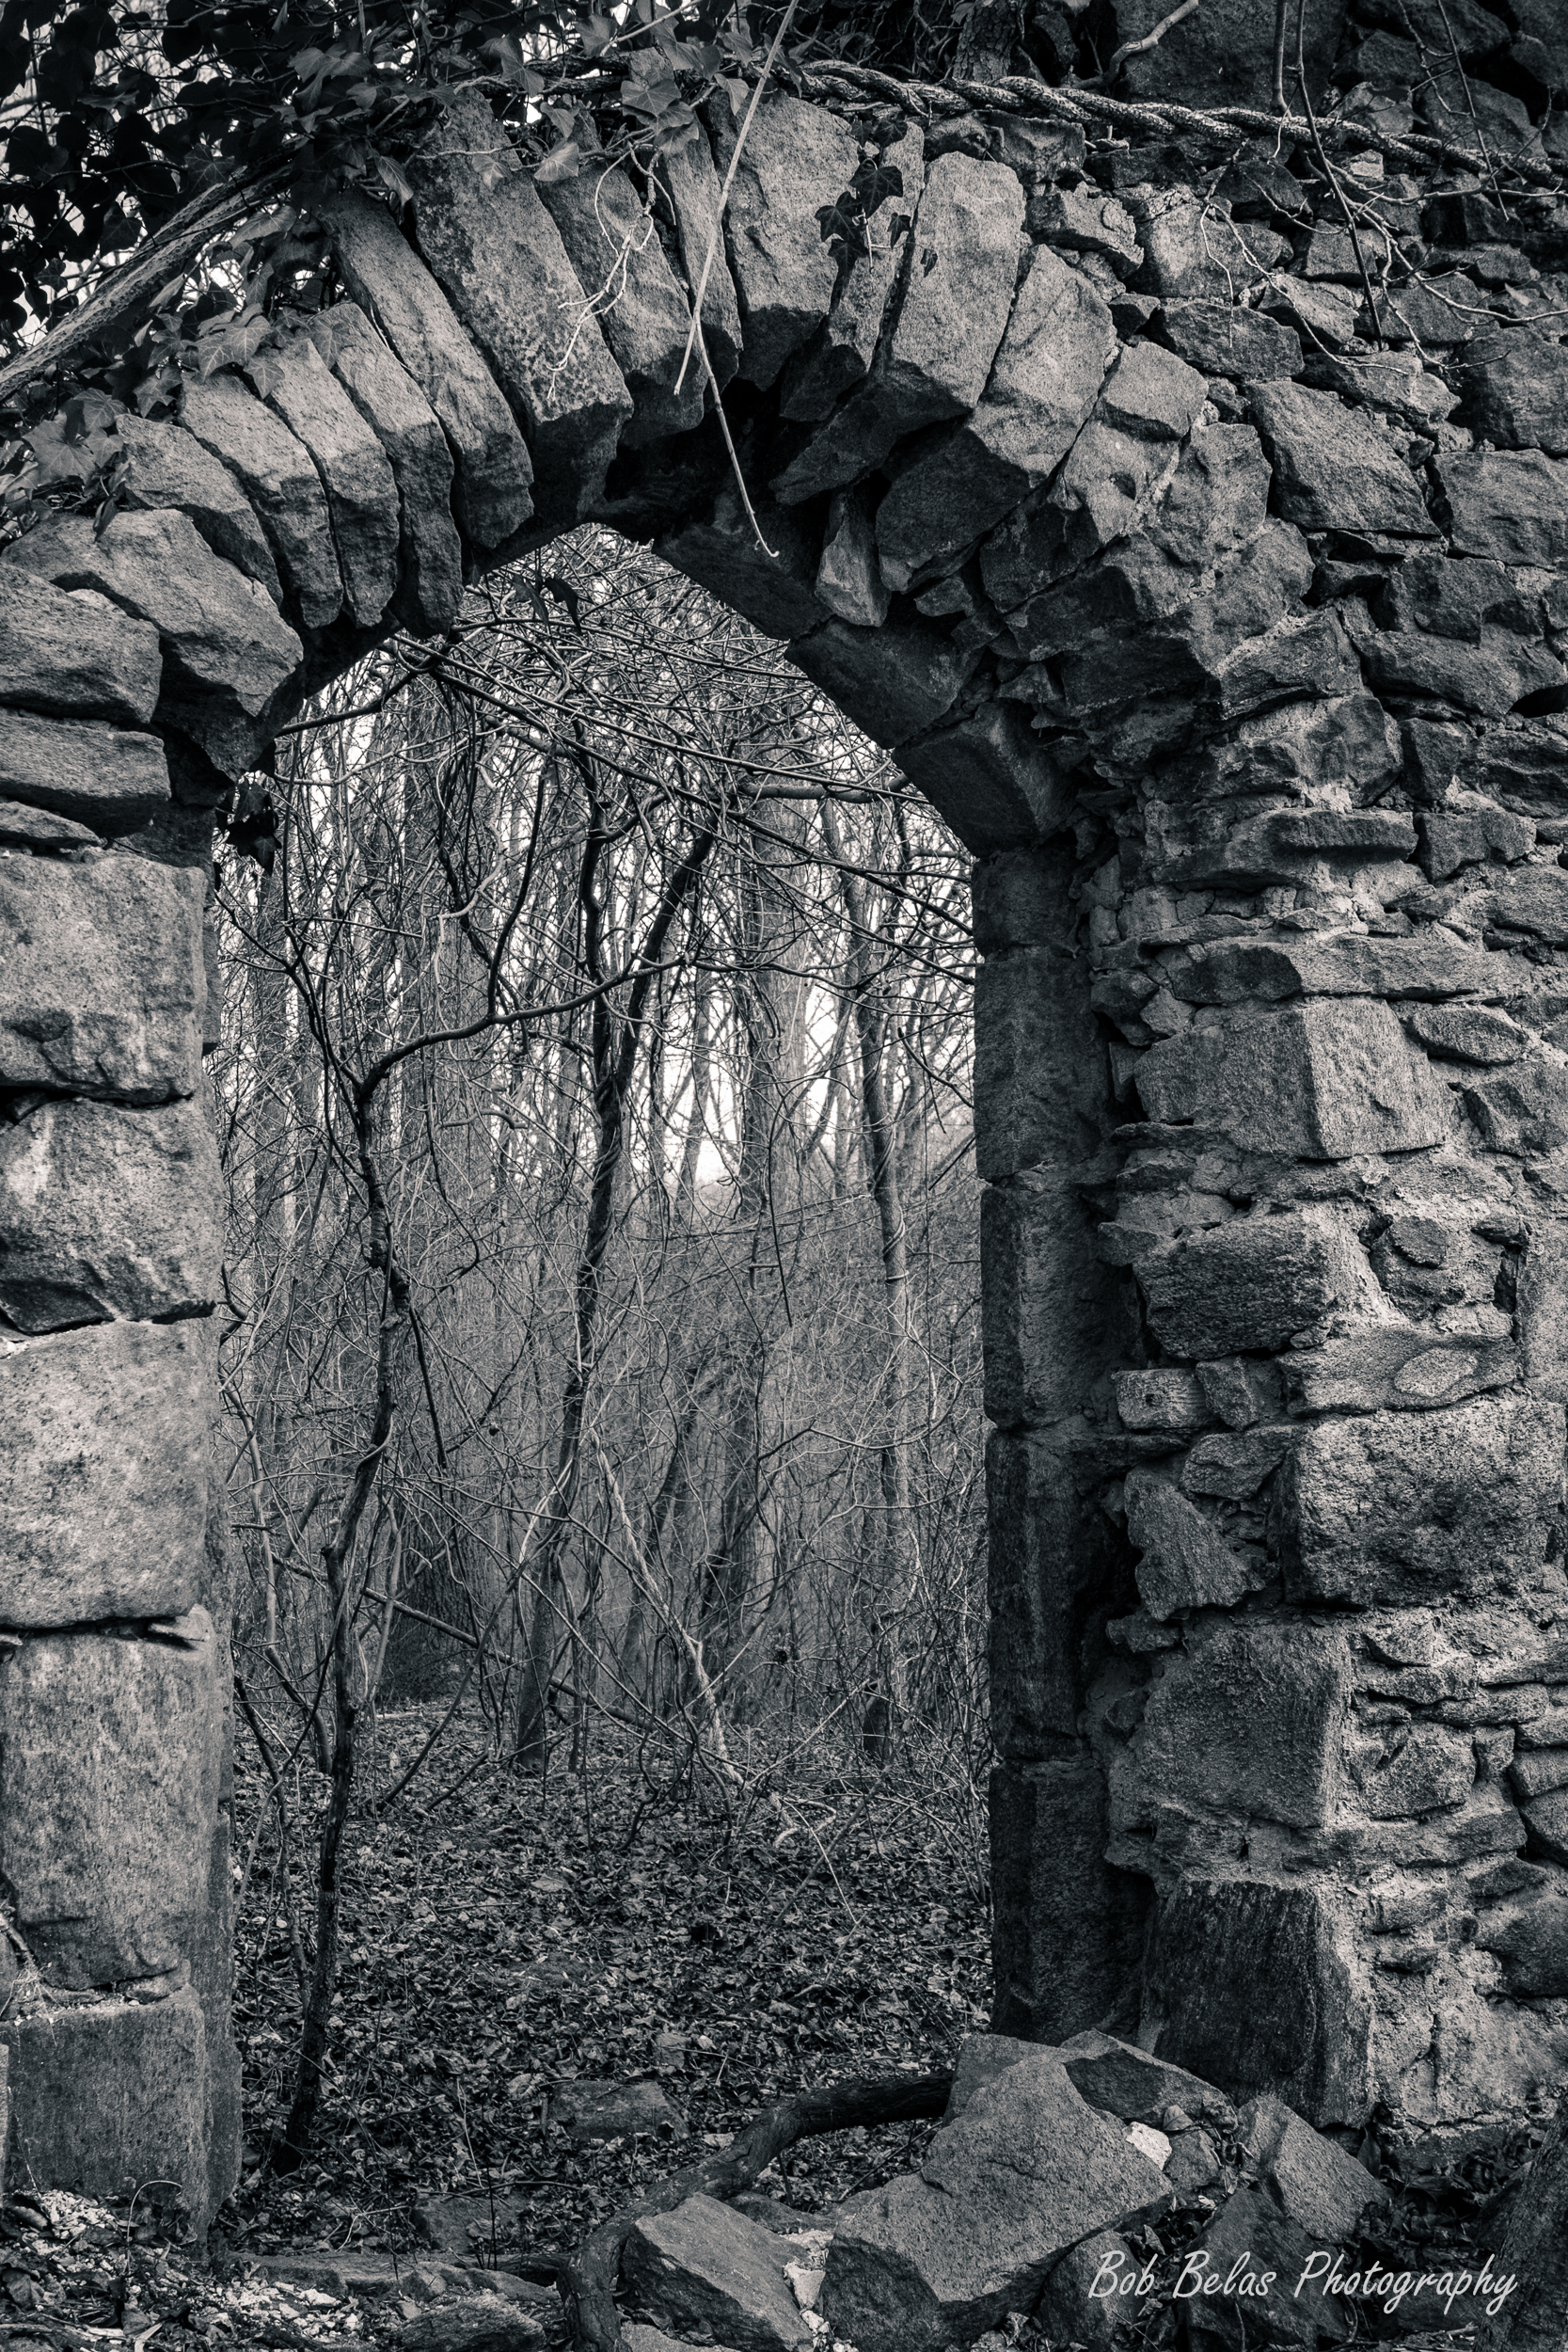 St Stanislaus Arch 1, monochrome